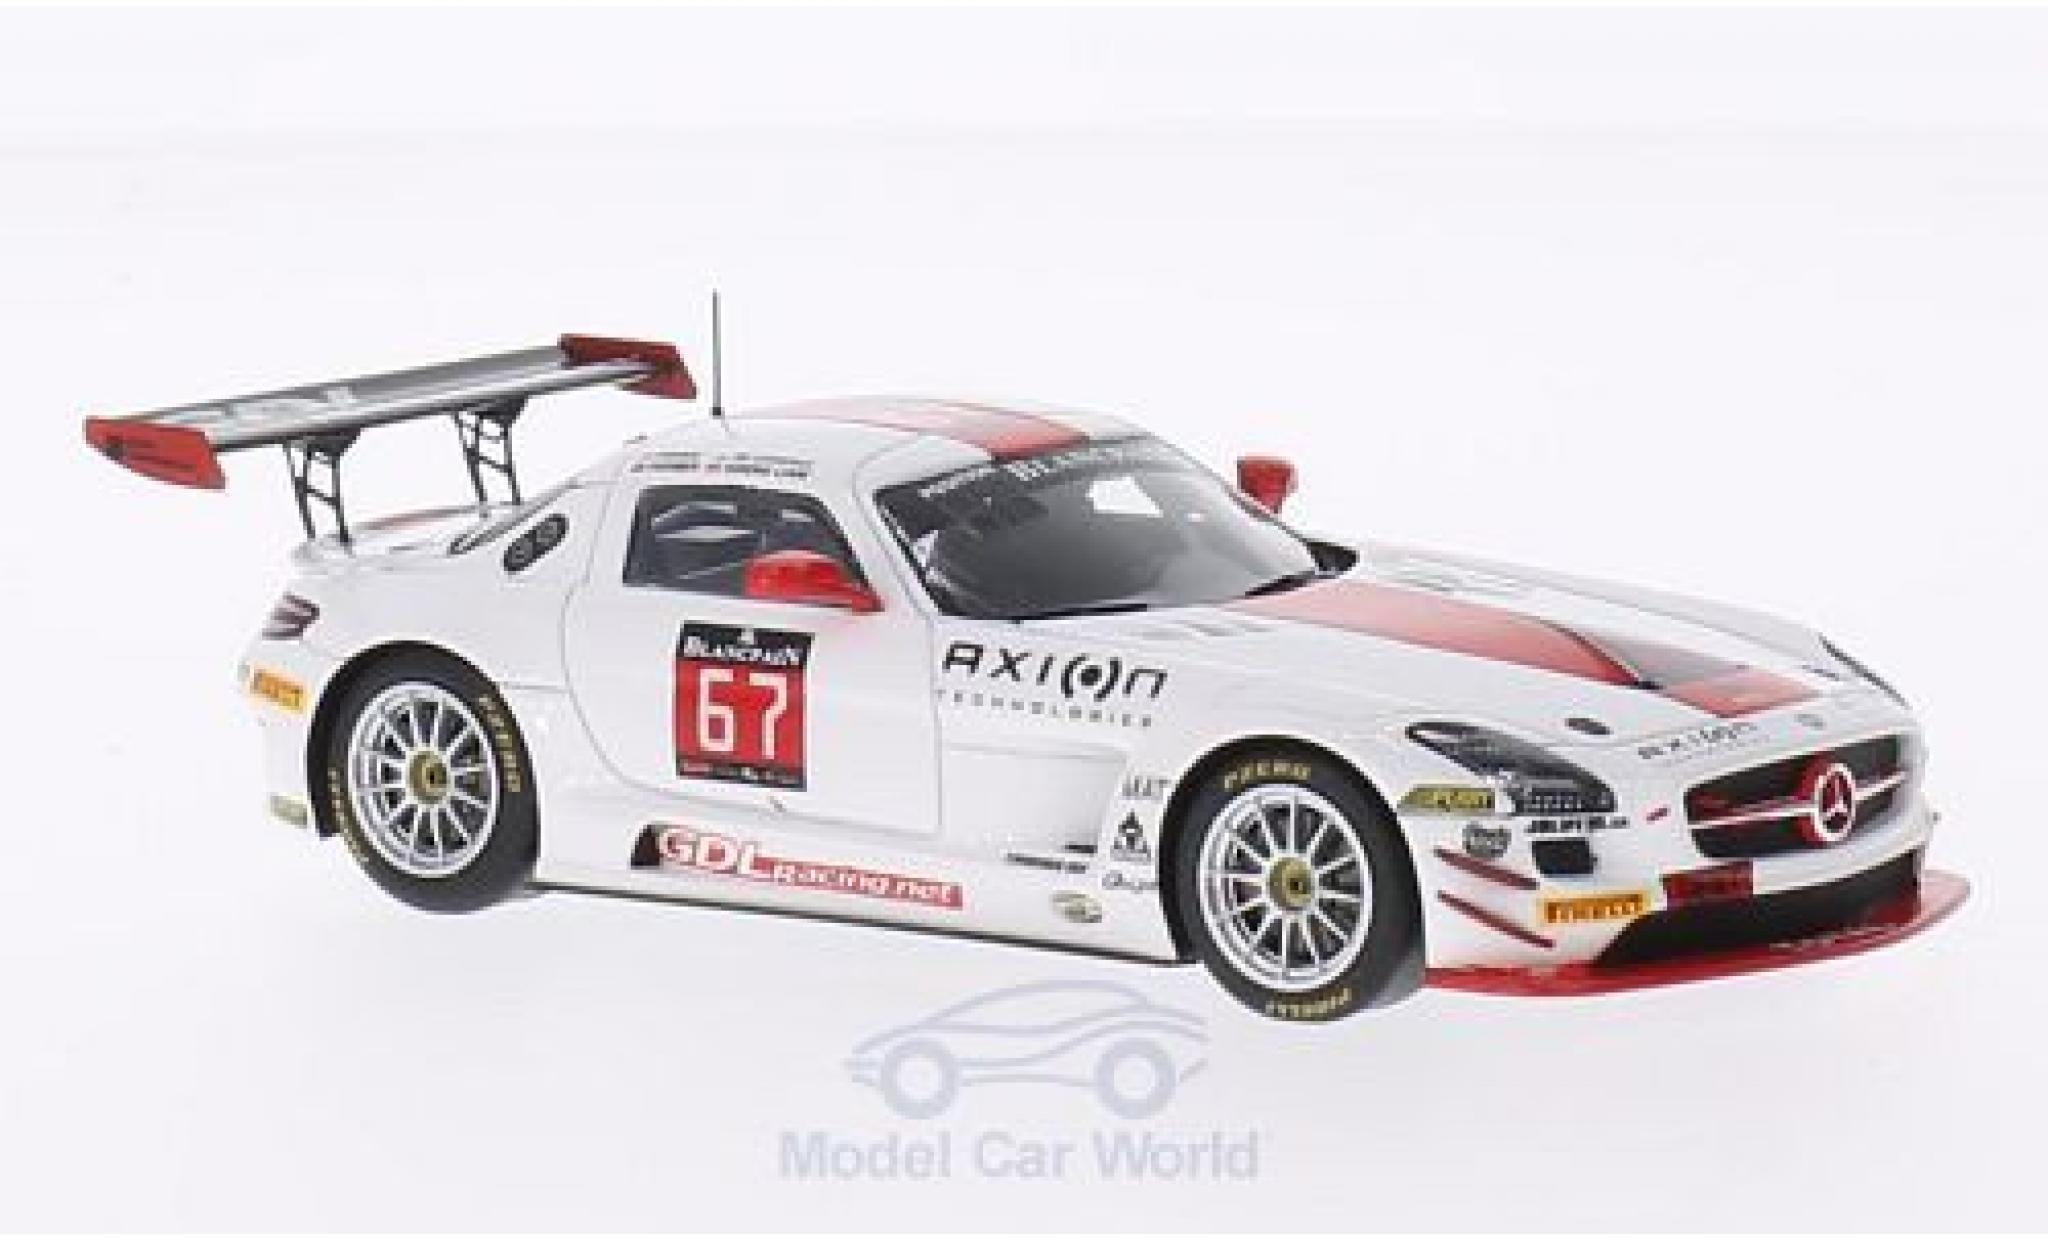 Mercedes SLS 1/43 Spark AMG GT3 No.67 GDL Motorsport 24h Spa 2014 G.De Lorenzi/N.Farmer/K.Liam Lim/J.C.Perrin